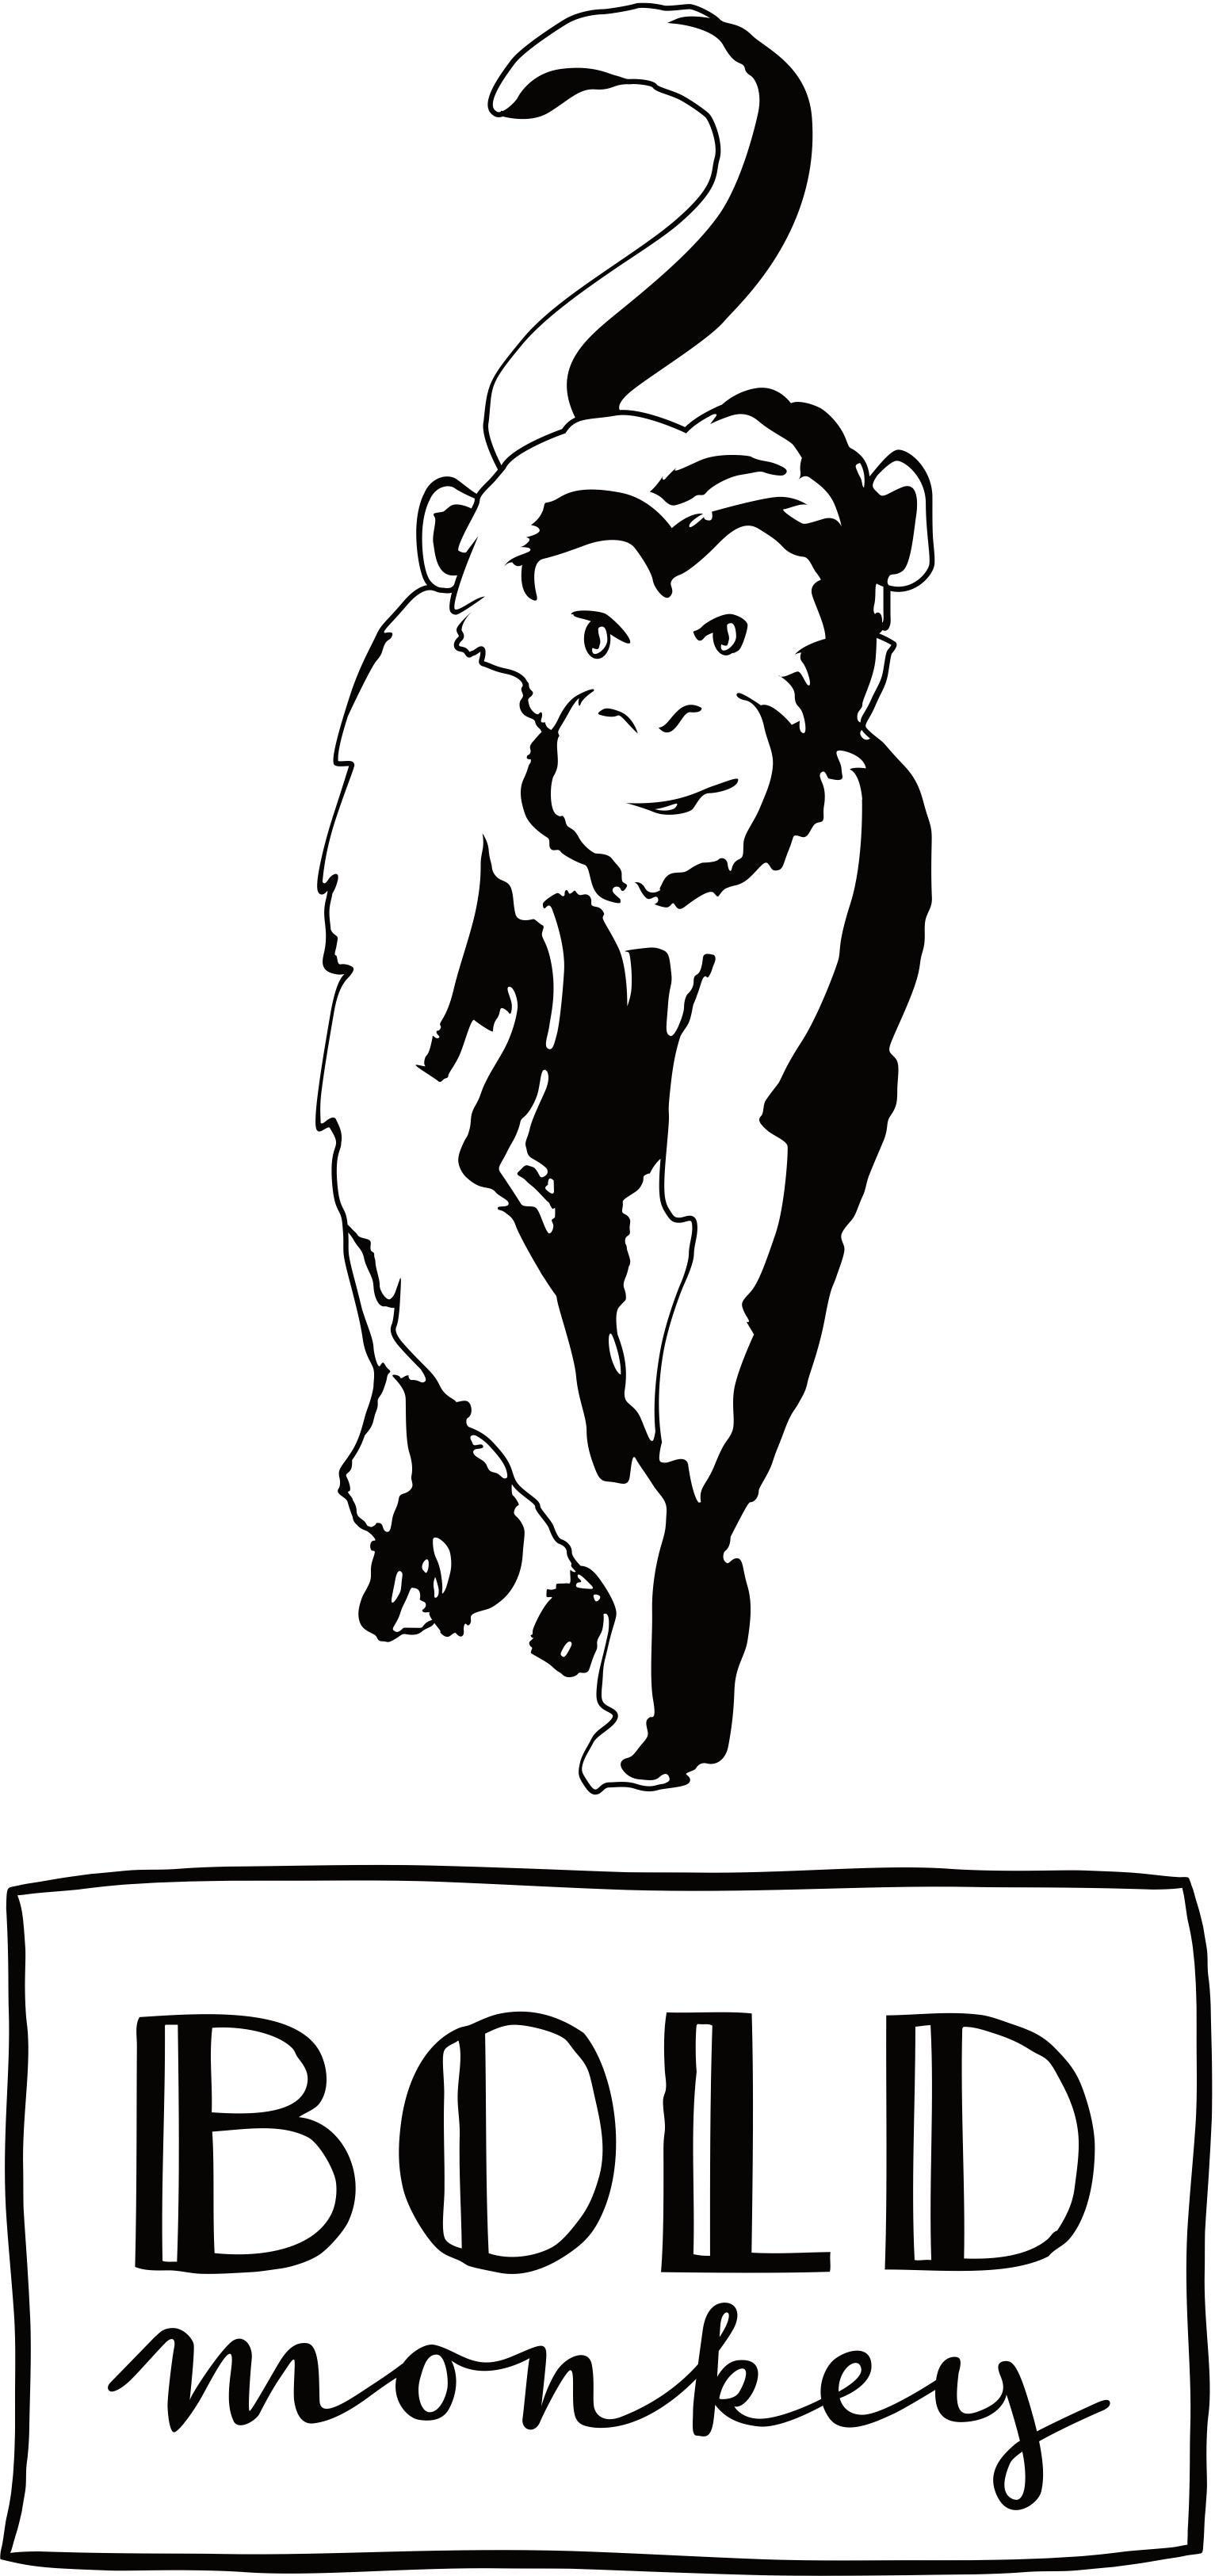 Bold Monkey A tall handsome statue Limited Edition gouden messing kraanvogel vogel hoog beeld